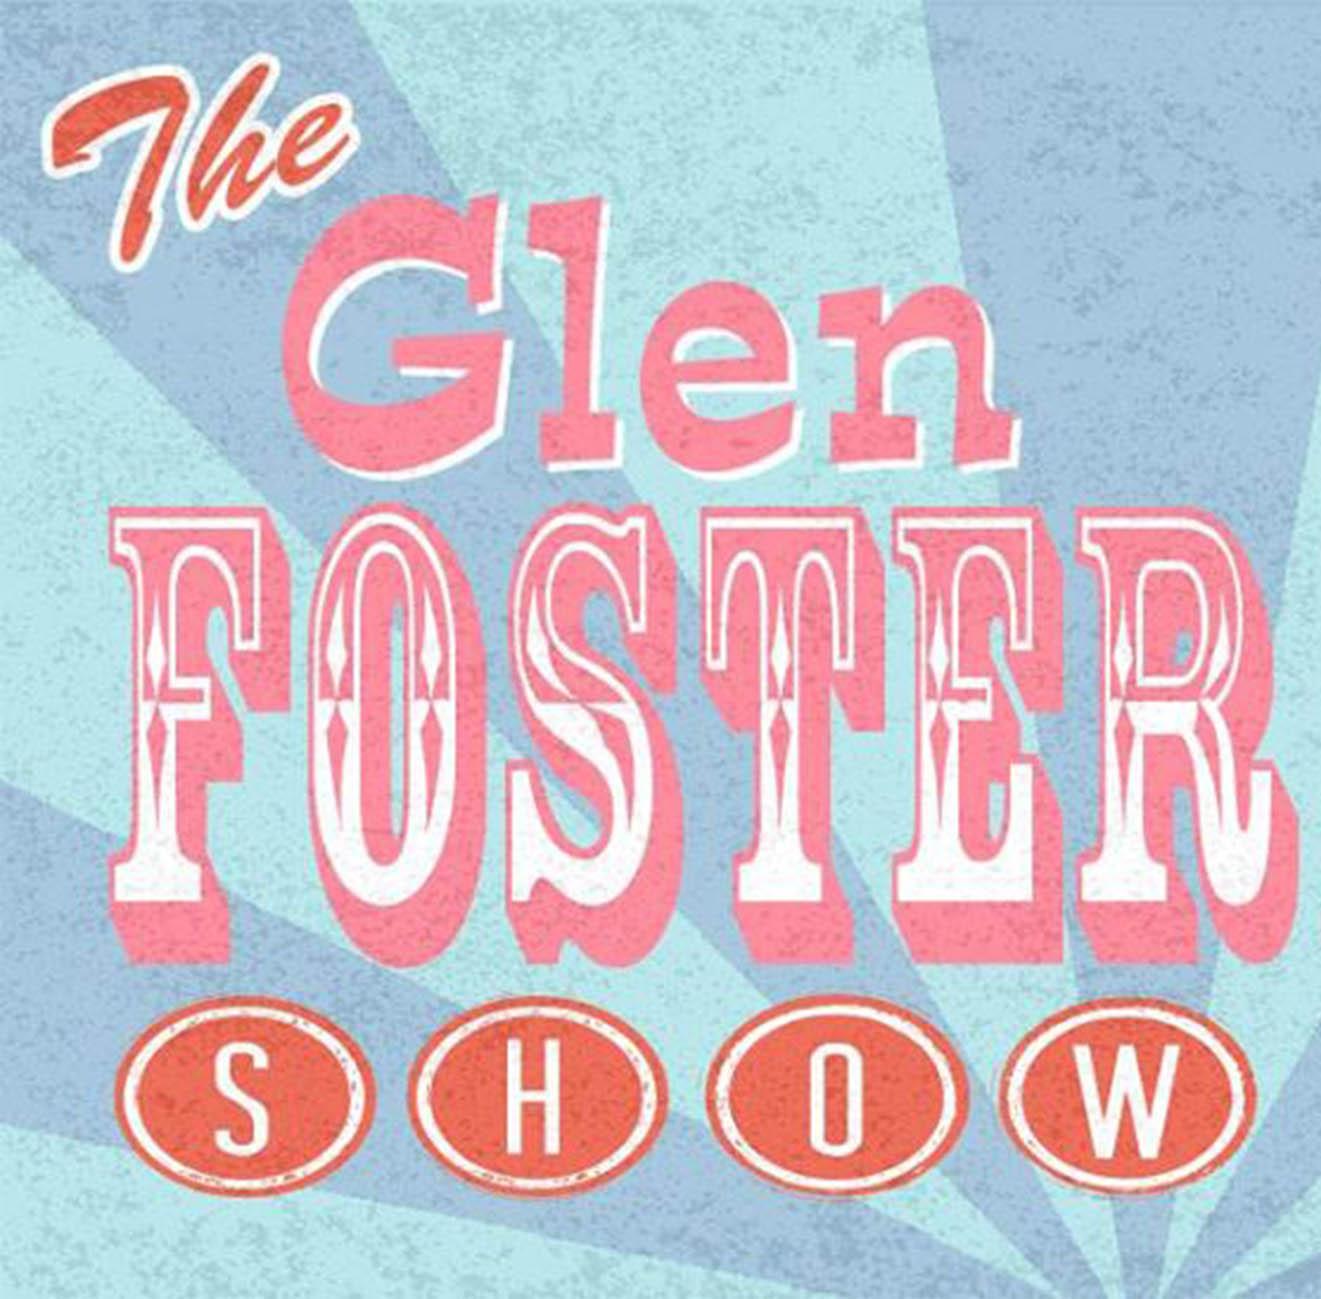 The Glen Foster Show logo